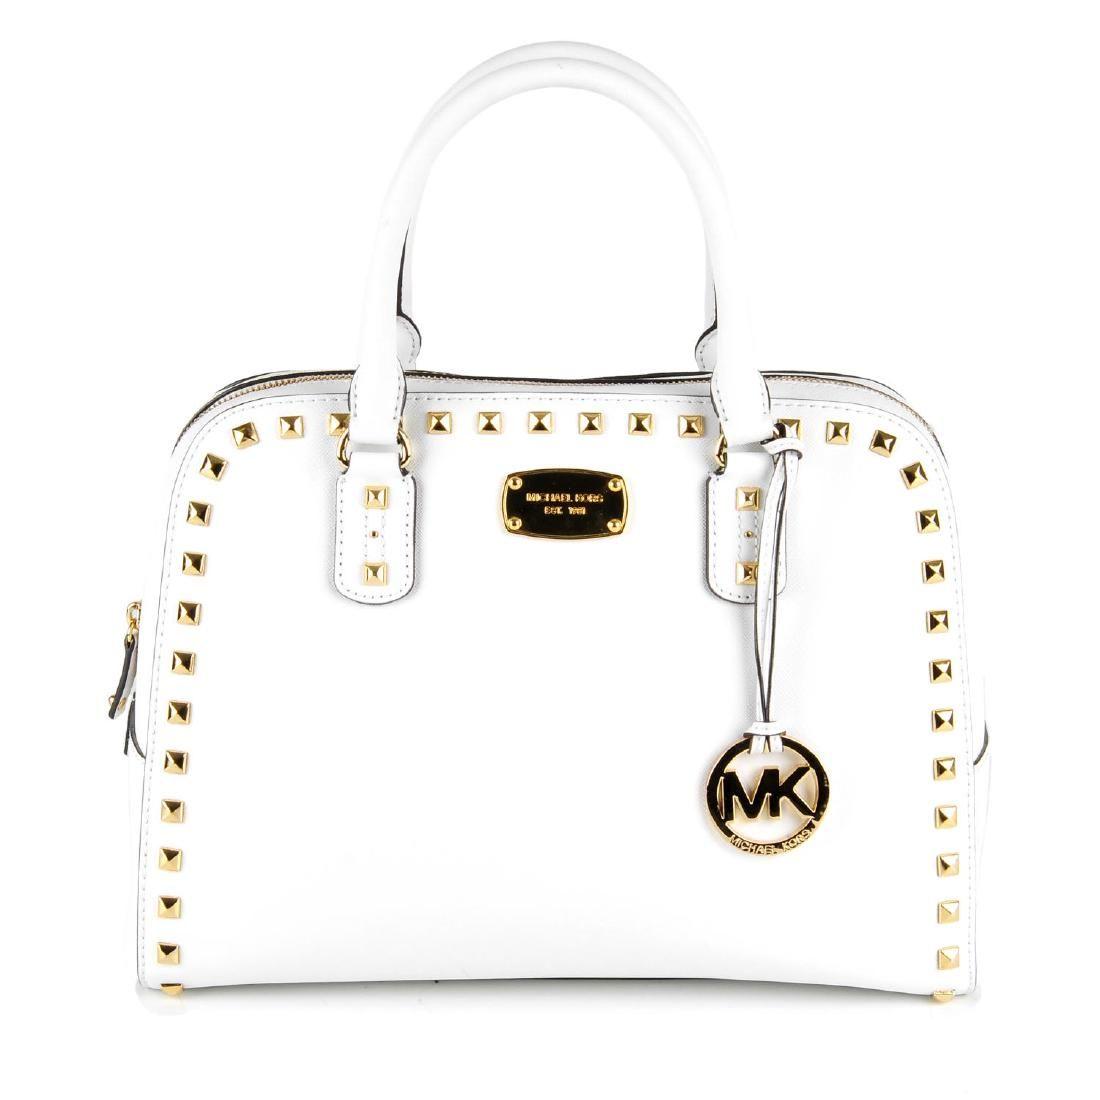 MICHAEL KORS - a white Medium Saffiano Stud satchel.